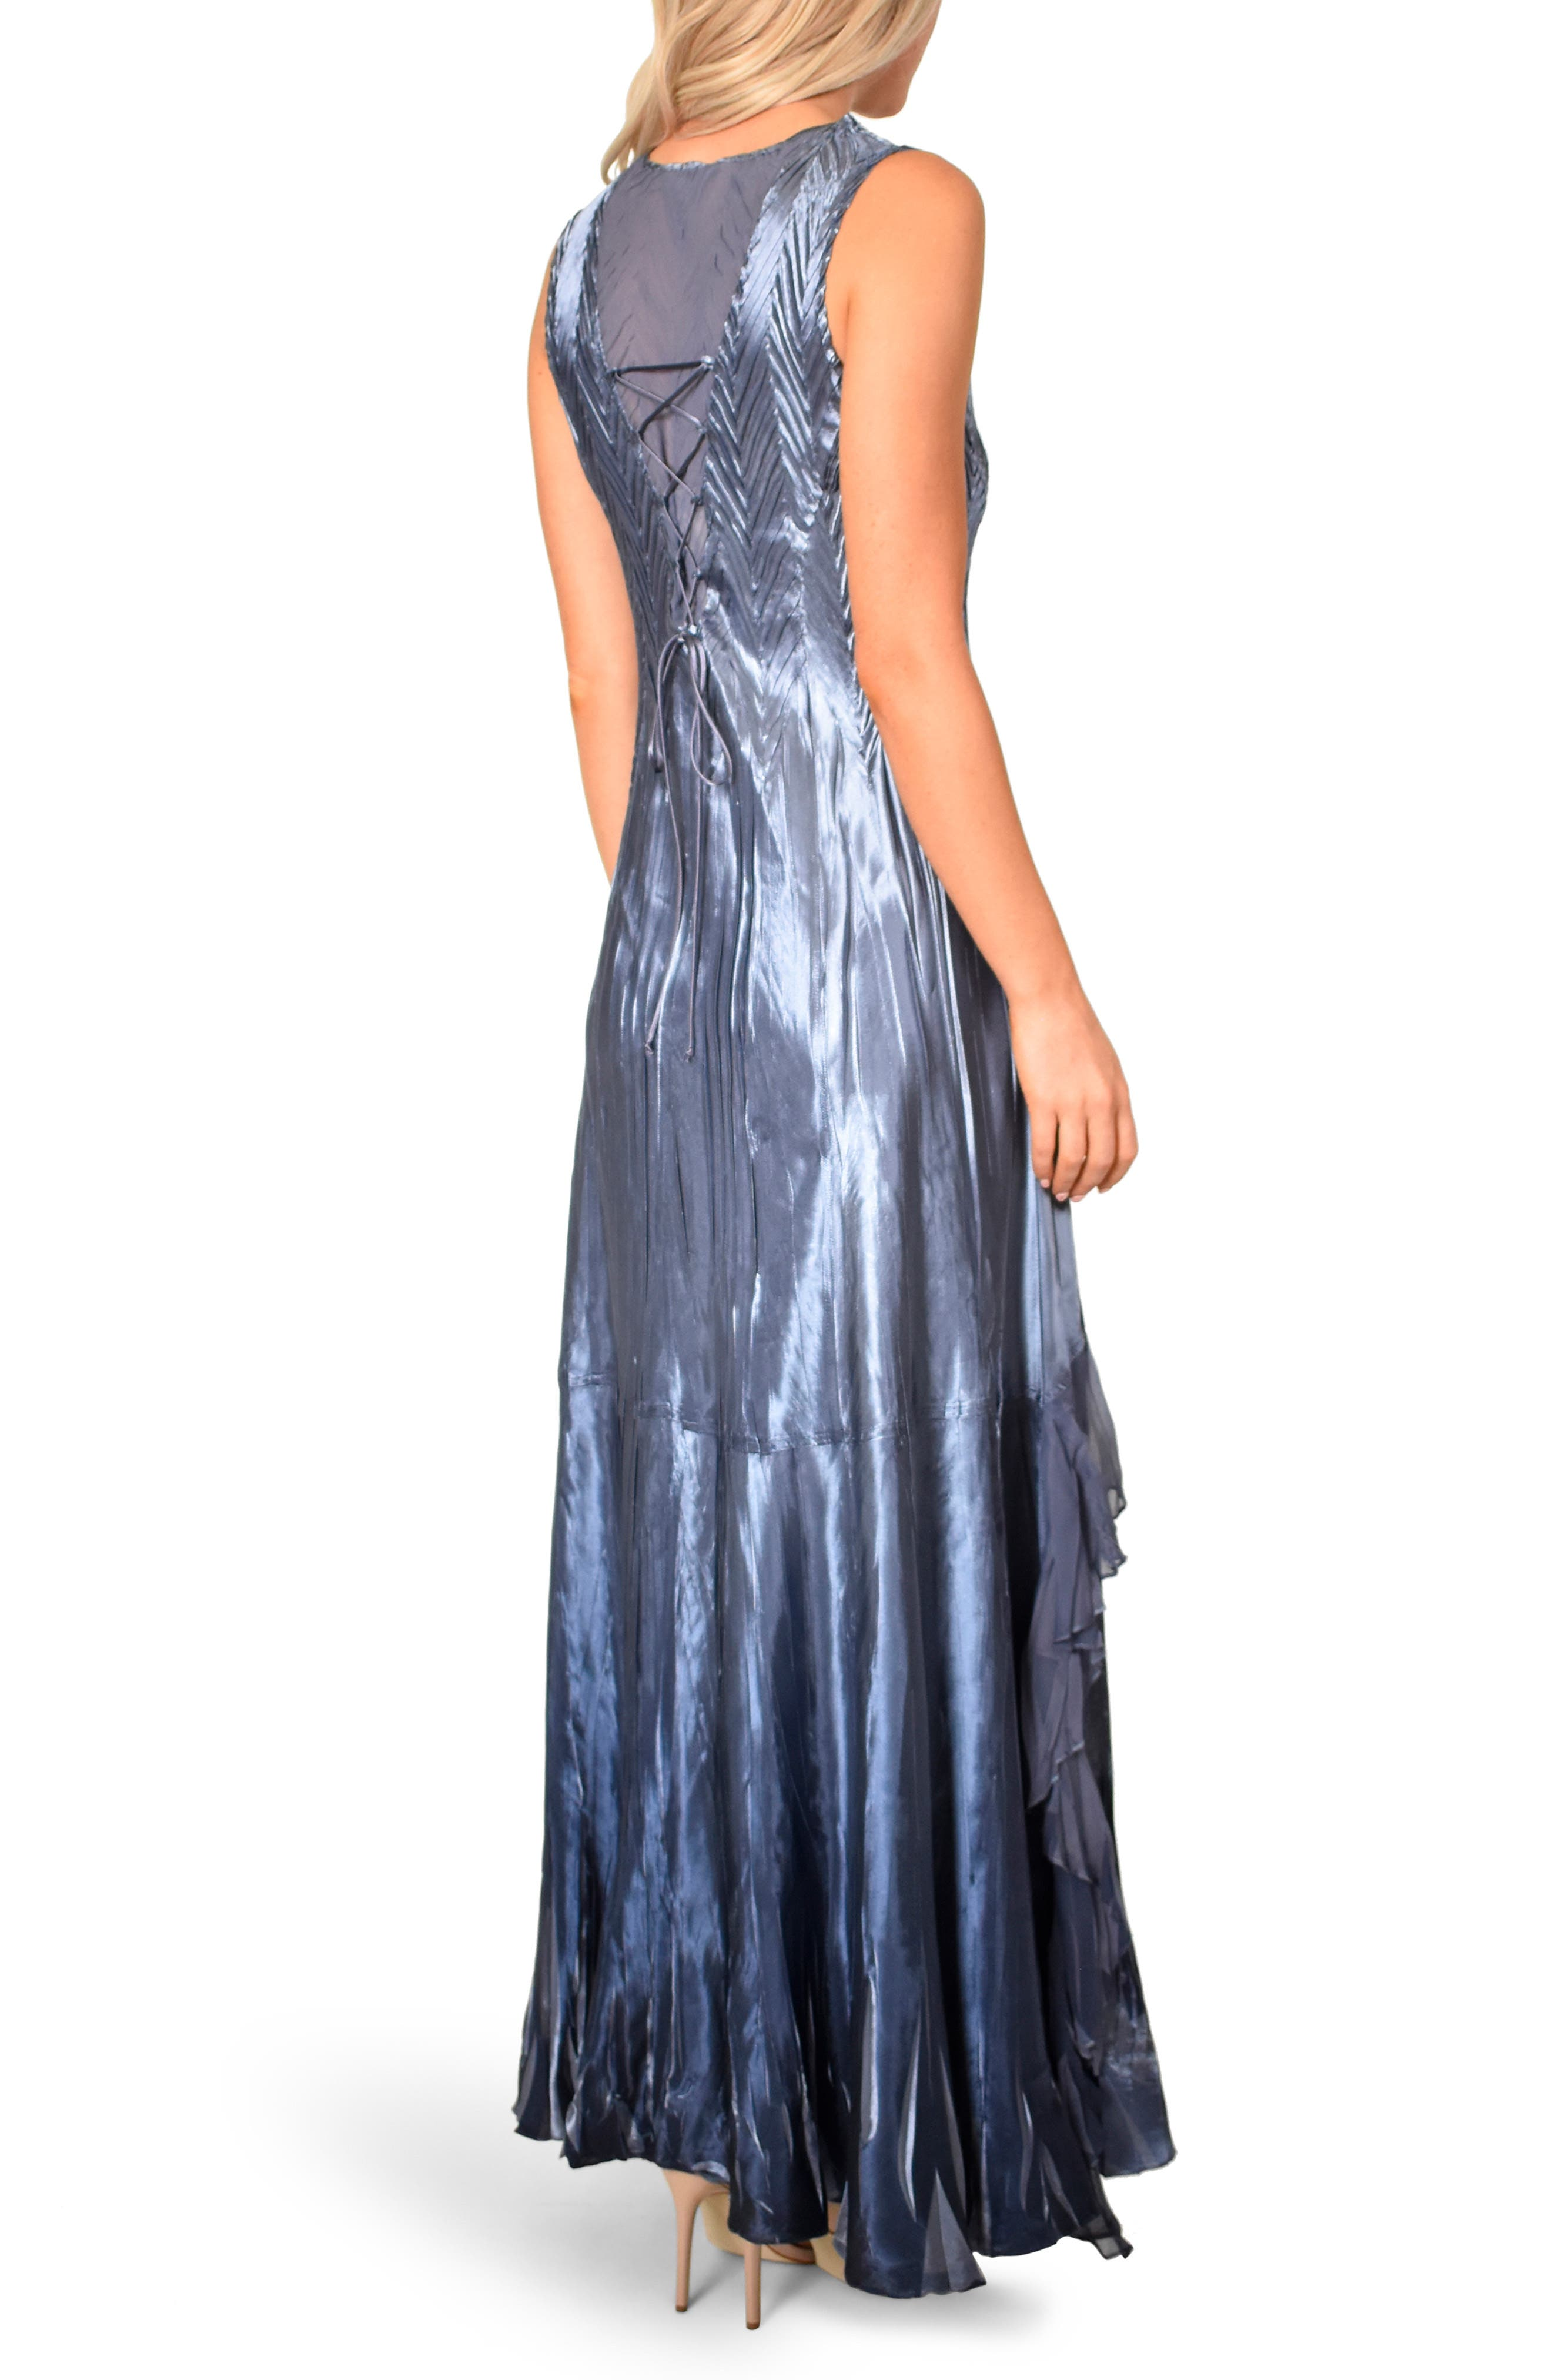 KOMAROV, Beaded V-Neck Charmeuse & Chiffon Evening Dress with Wrap, Alternate thumbnail 2, color, PURPLE SAGE BLUE OMBRE